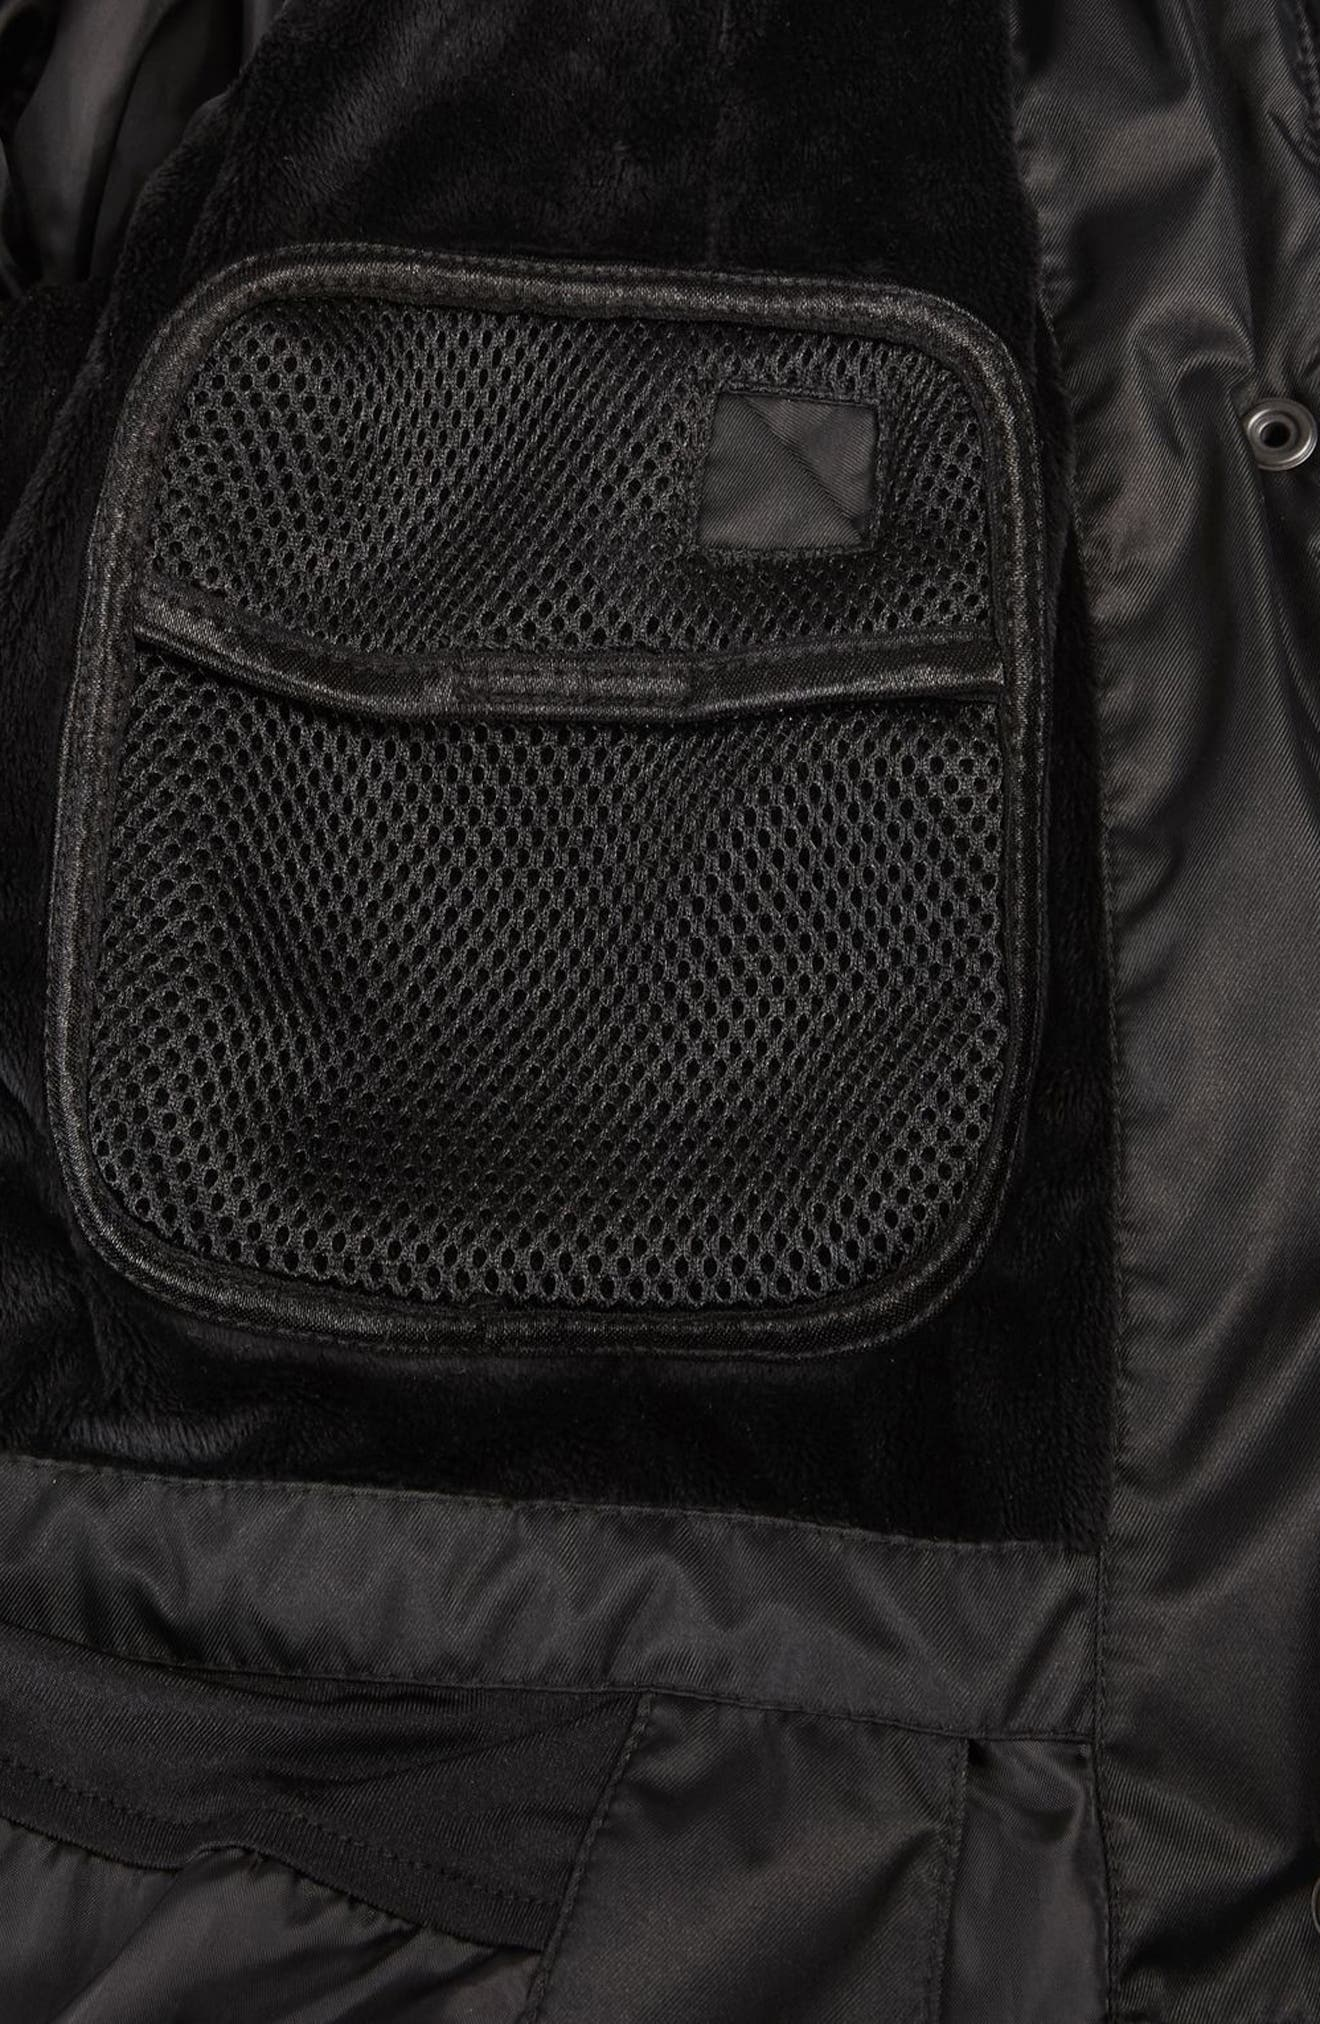 SNO Amazon Puffer Jacket,                             Alternate thumbnail 6, color,                             Black